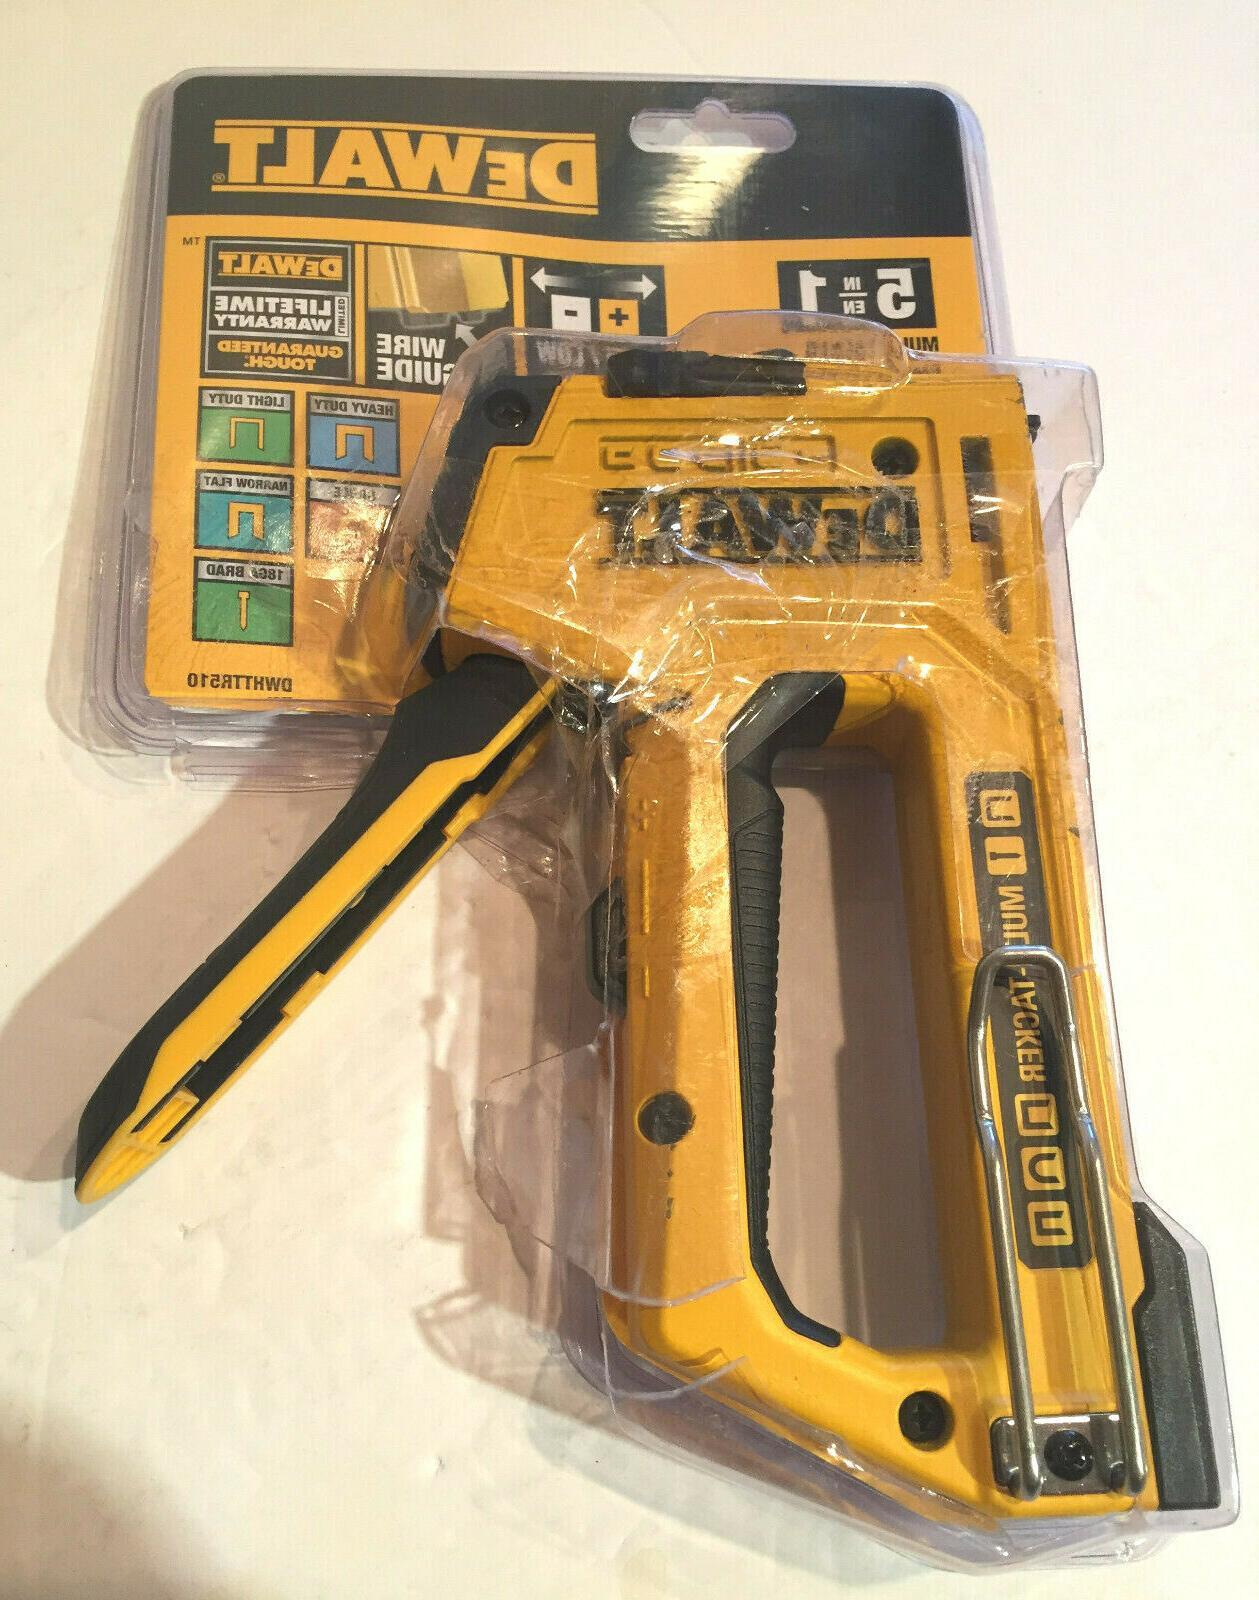 5 in 1 multi tacker stapler gun